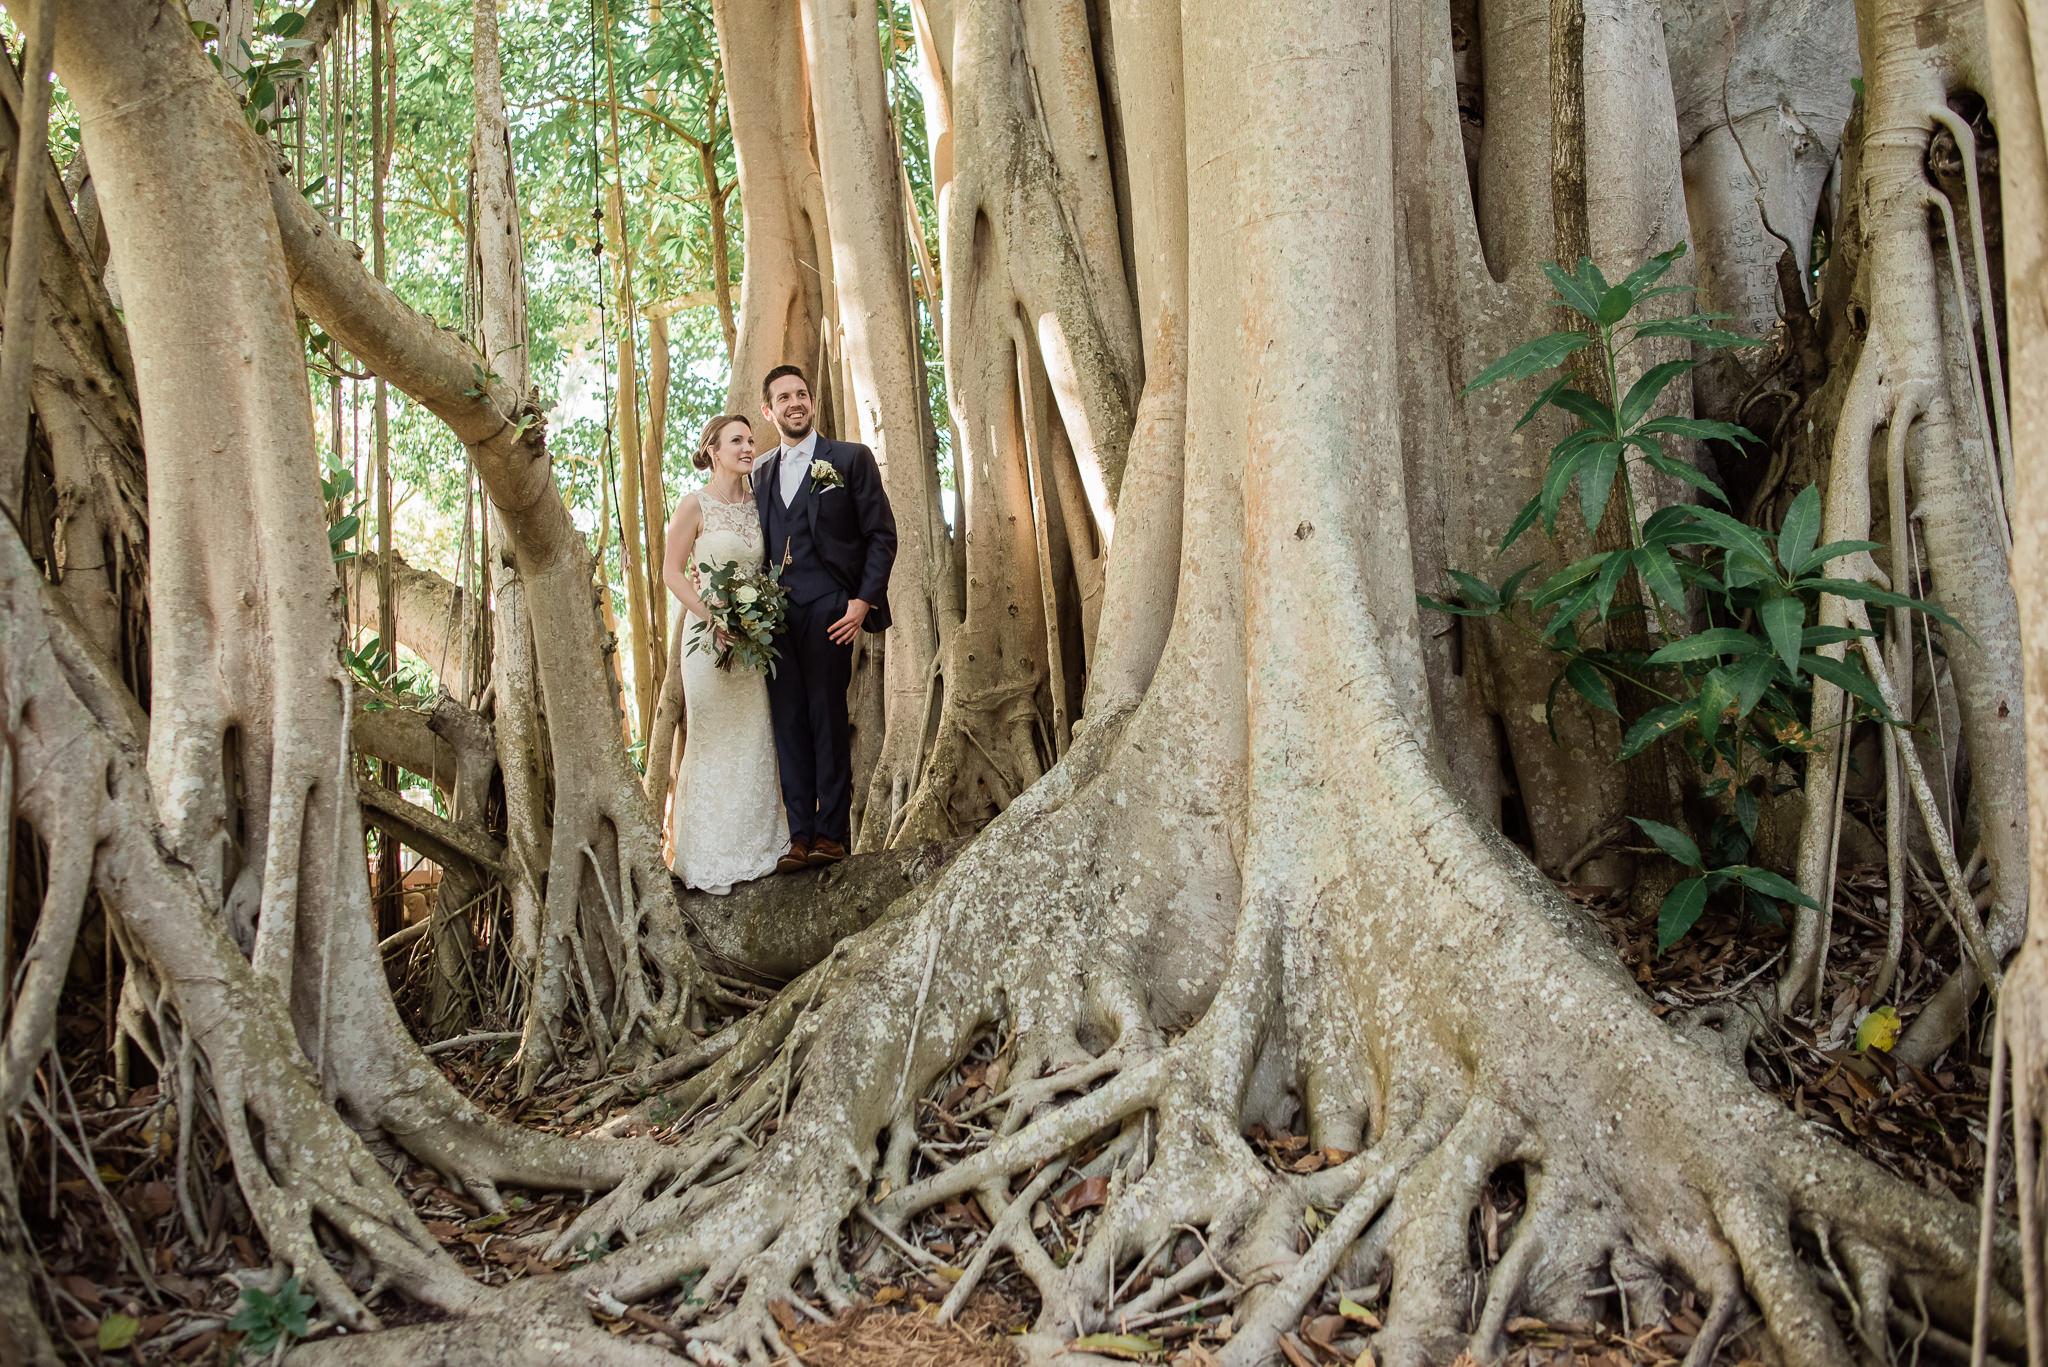 TAMPA_WEDDING_PHOTOGRAPHER_AKMZ_BANYON_GROVE_40.jpg